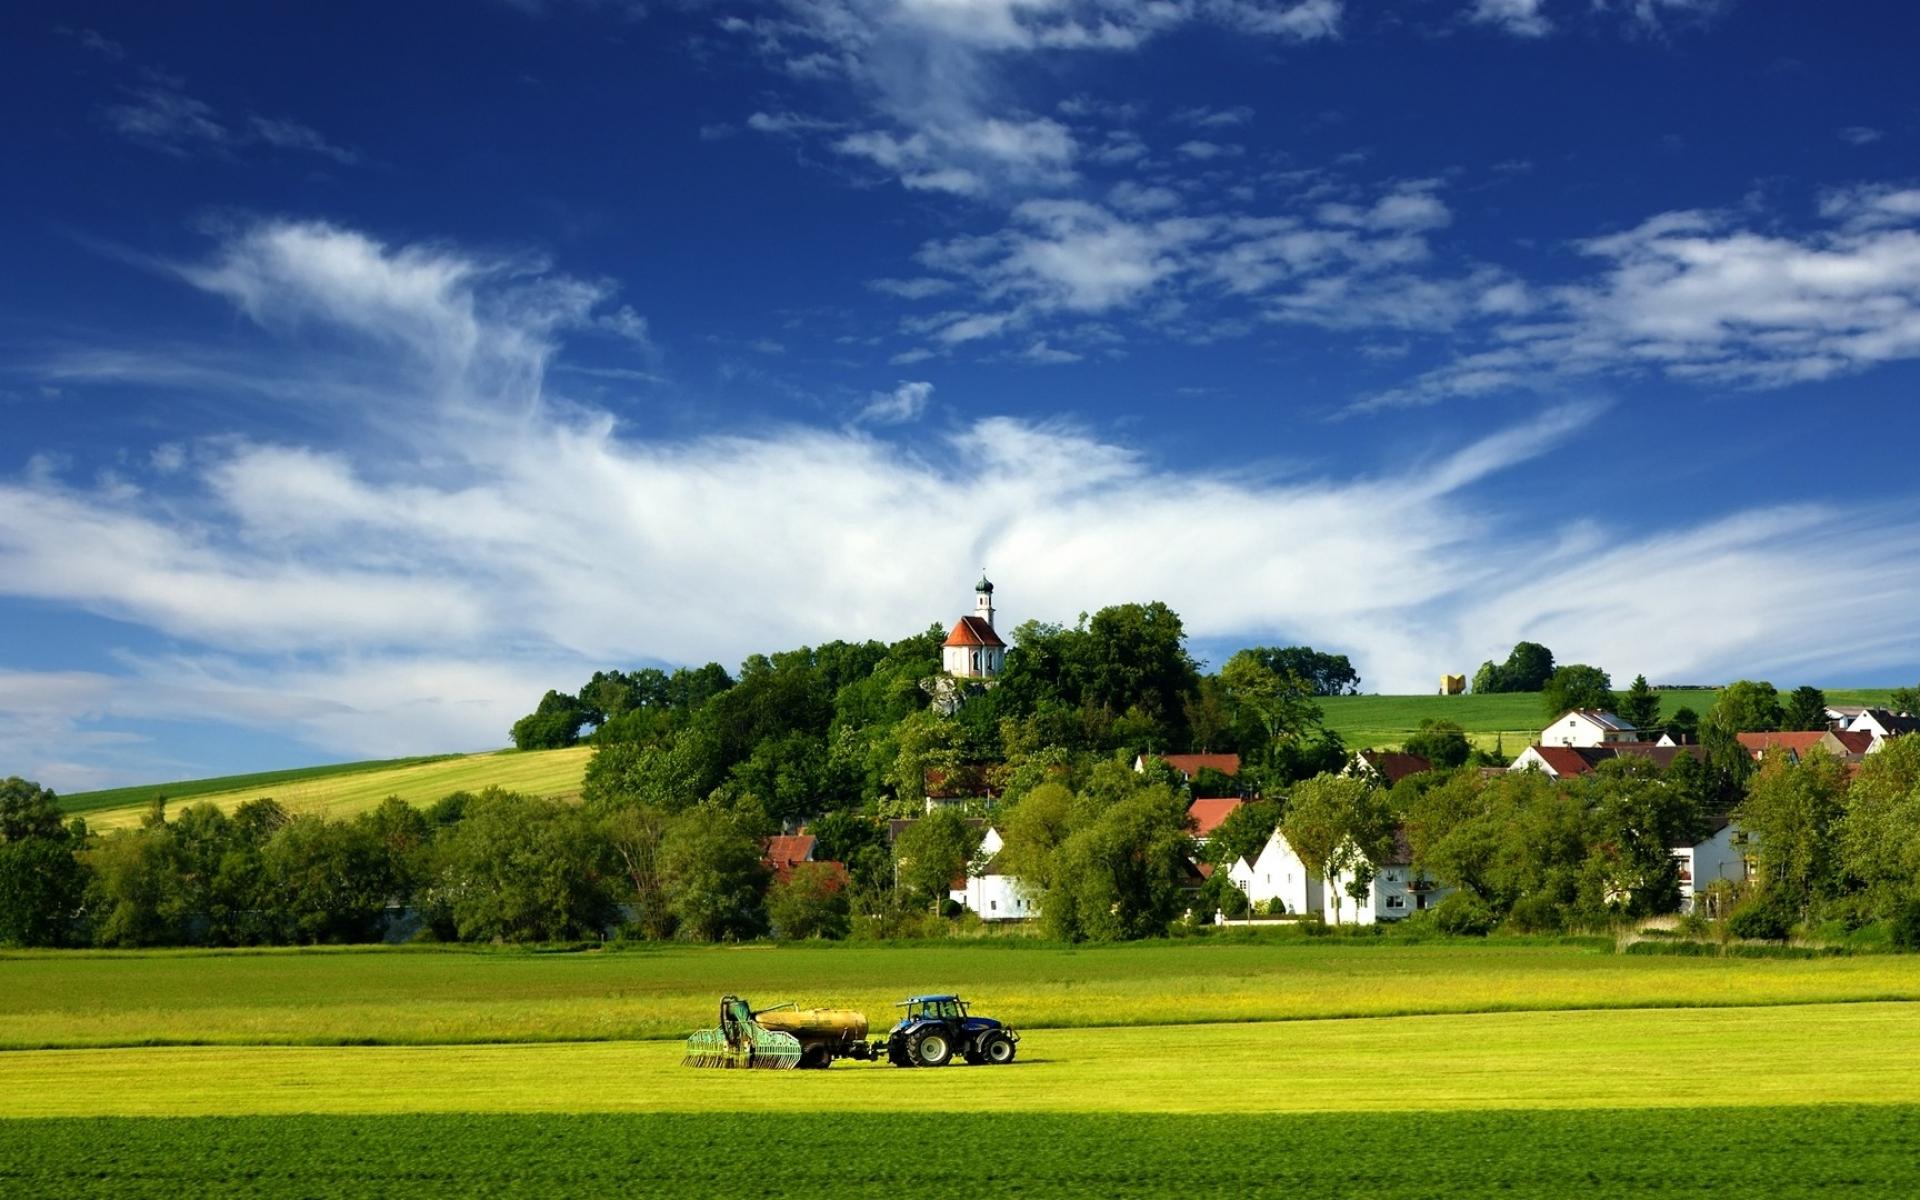 Tractor Village and Farm Country desktop wallpaper WallpaperPixel 1920x1200